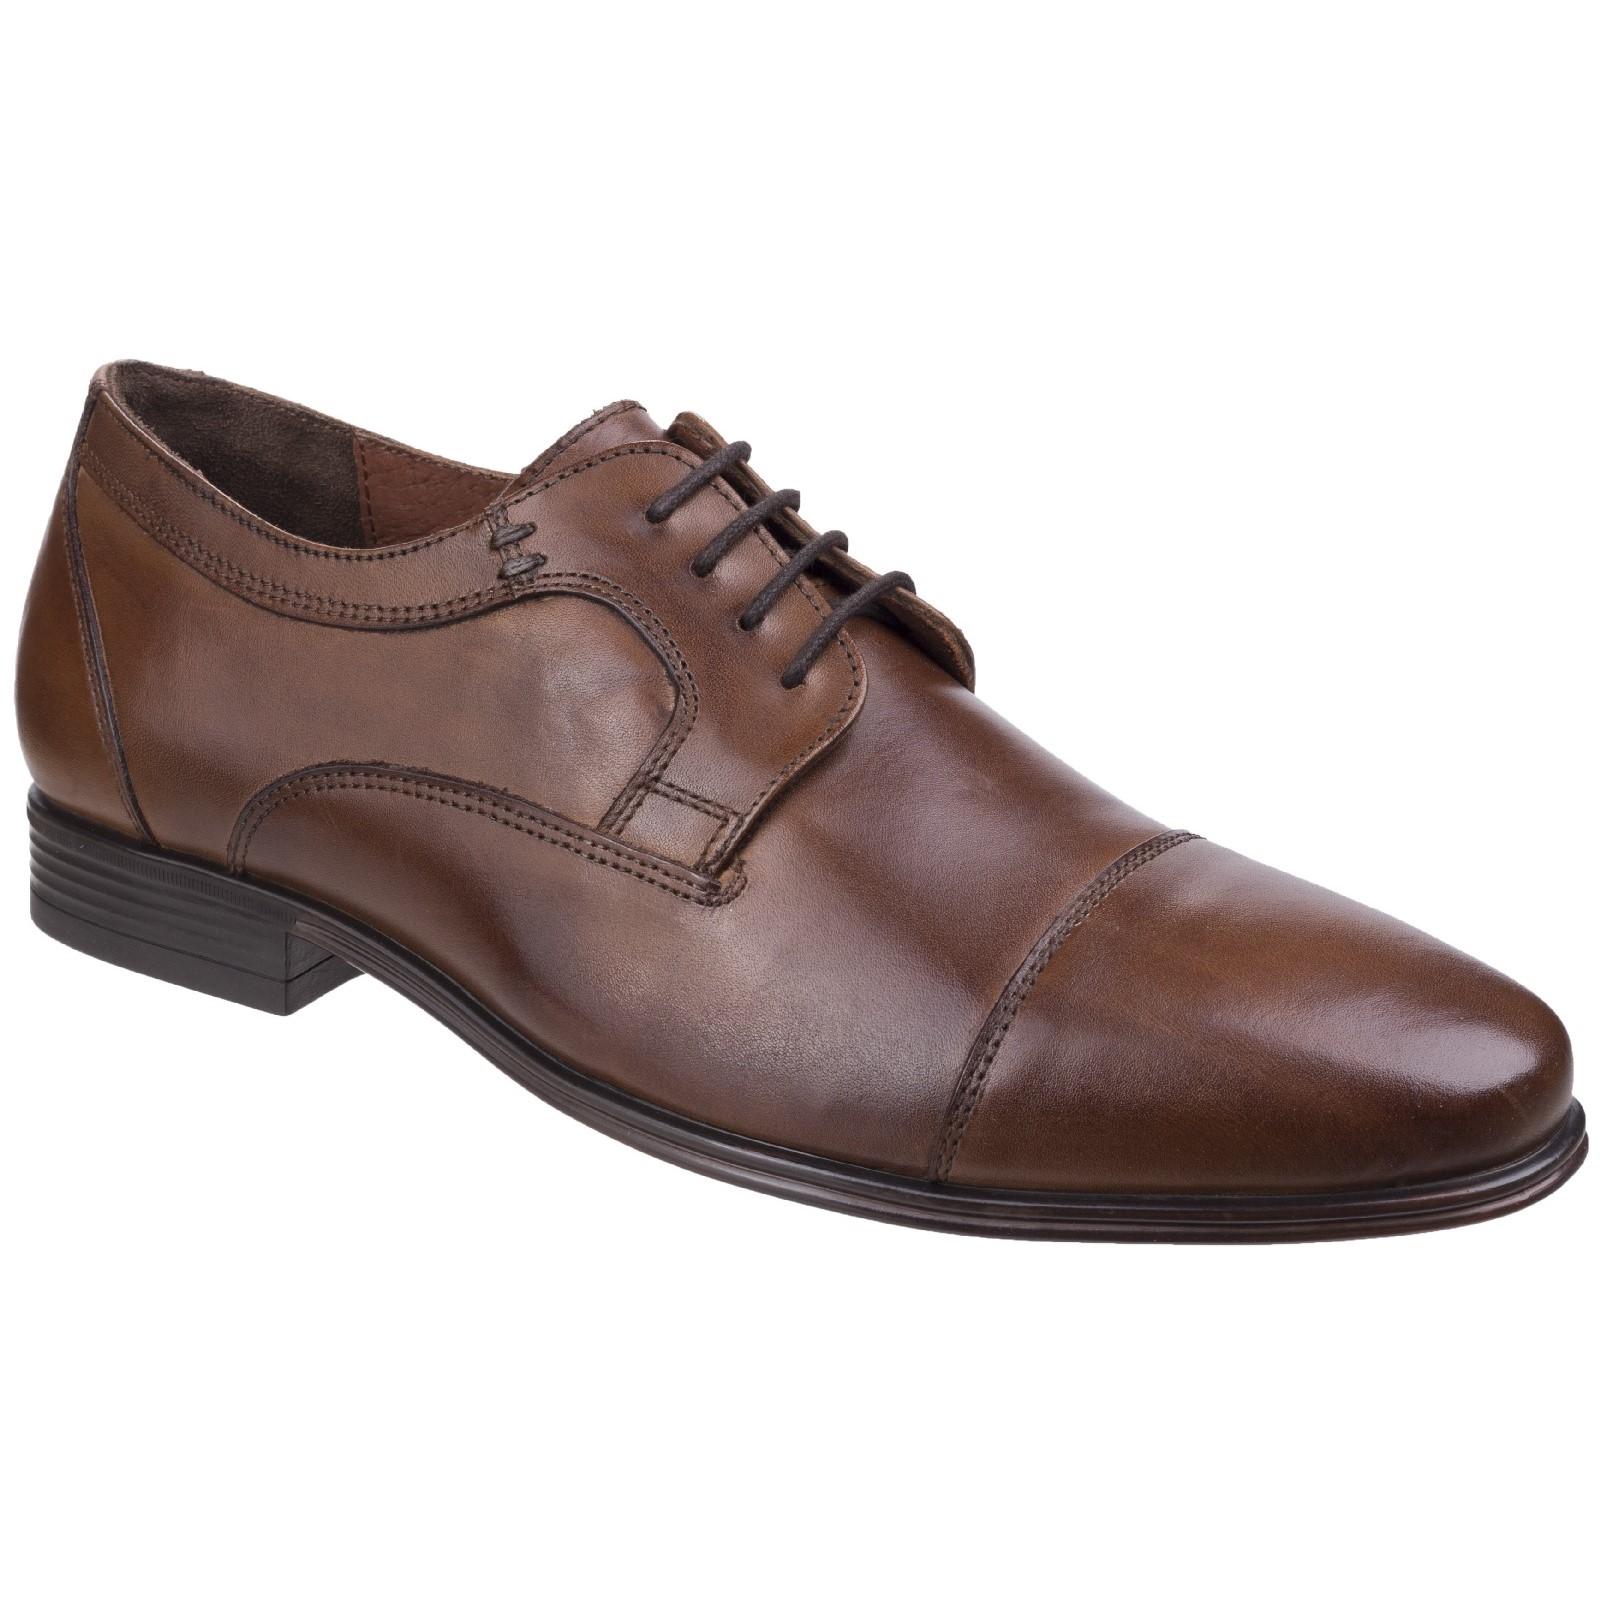 Hush Puppies Homme Bertrand Cap Toe chaussures